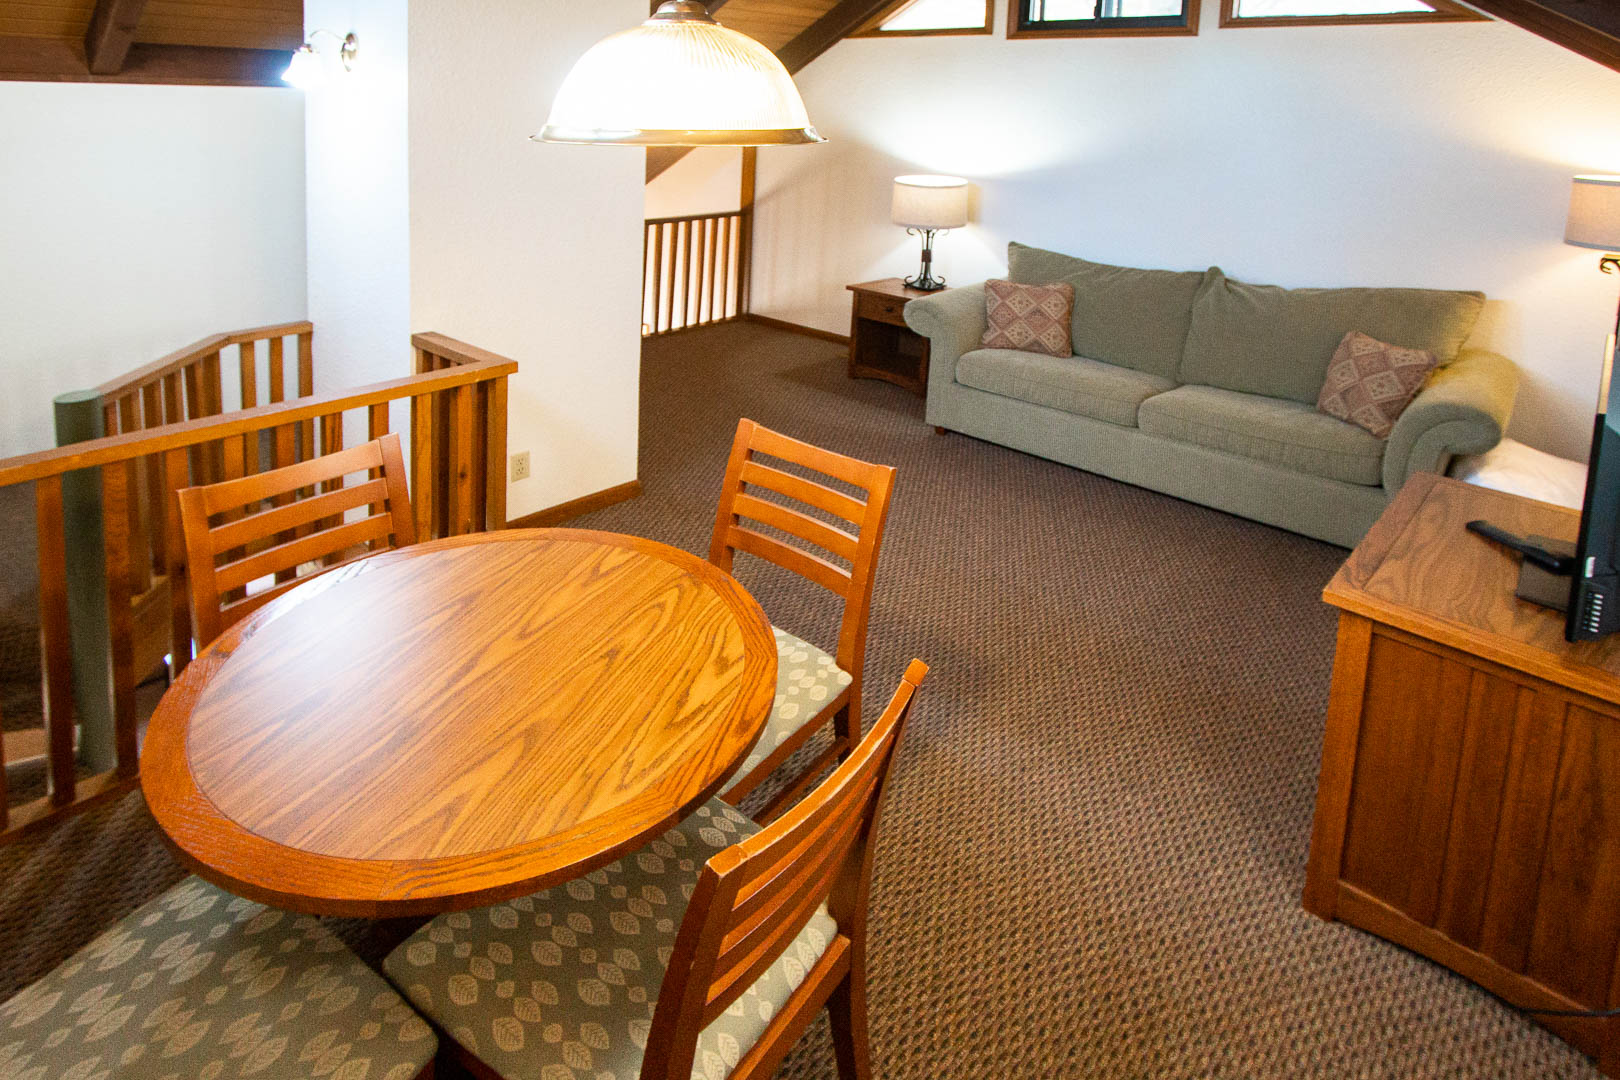 A cozy dining table at VRI's Mountain Loft Resort in North Carolina.